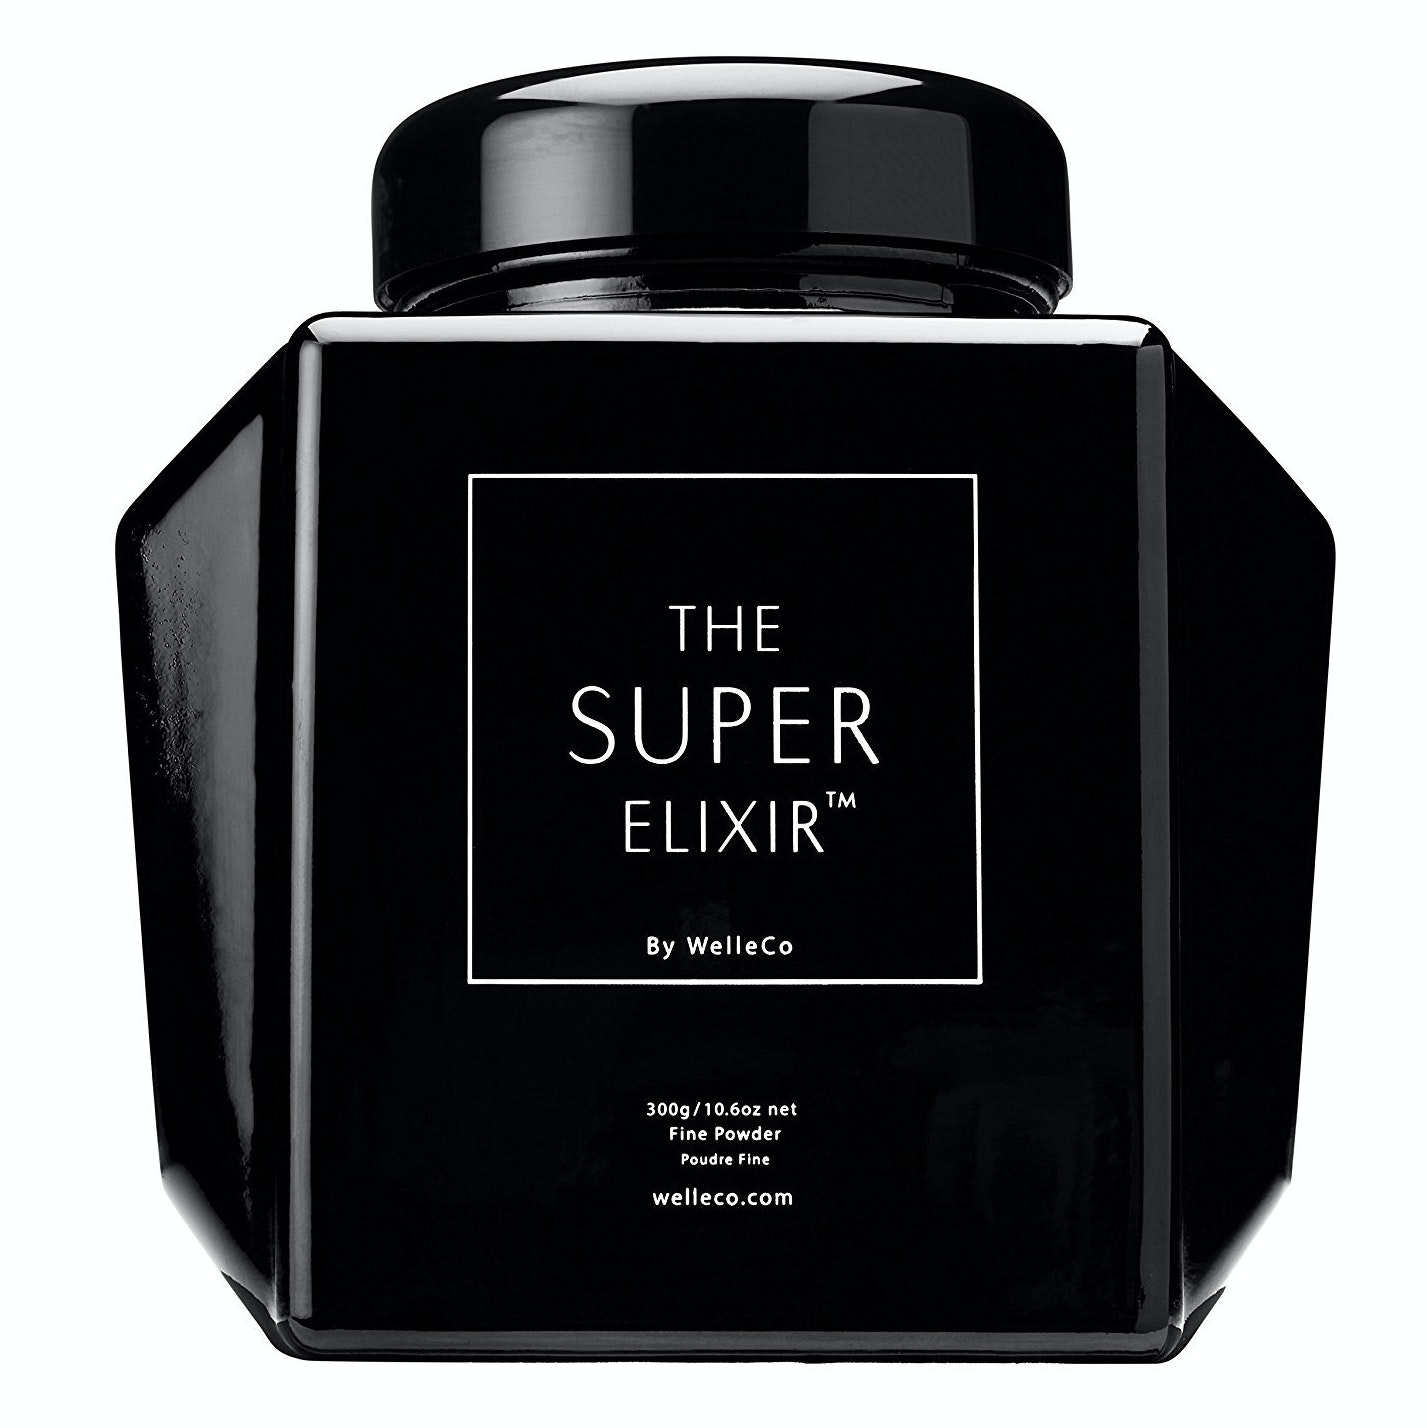 WelleCo® The Super Elixir™ Caddy